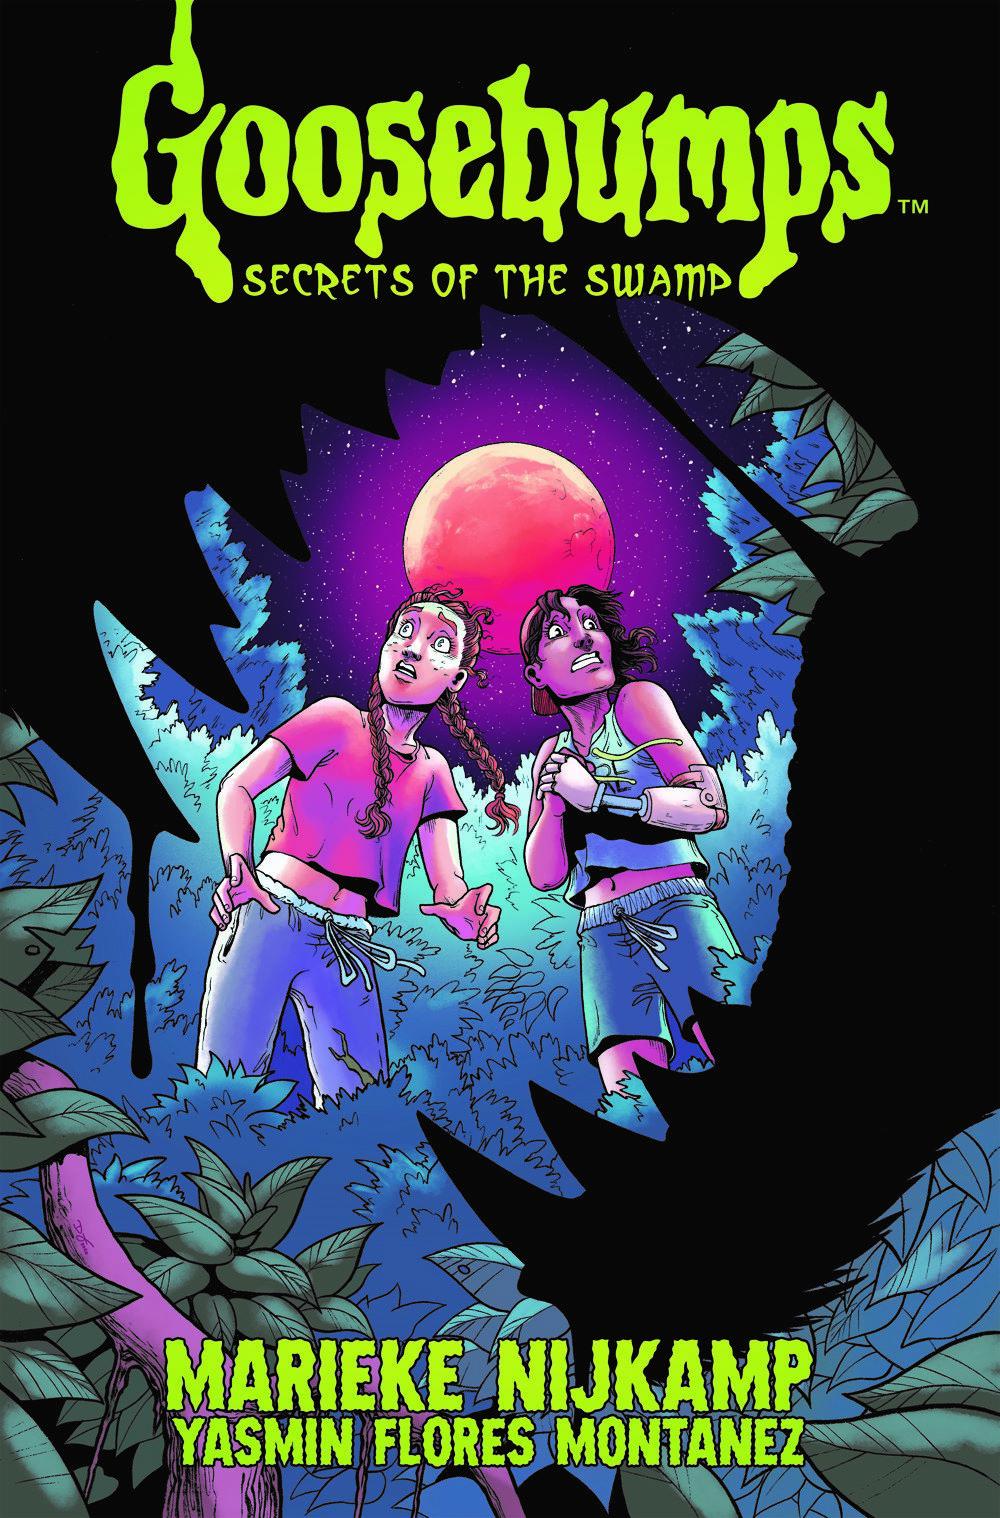 Goosebumps_SotS_cvr ComicList: IDW Publishing New Releases for 05/05/2021